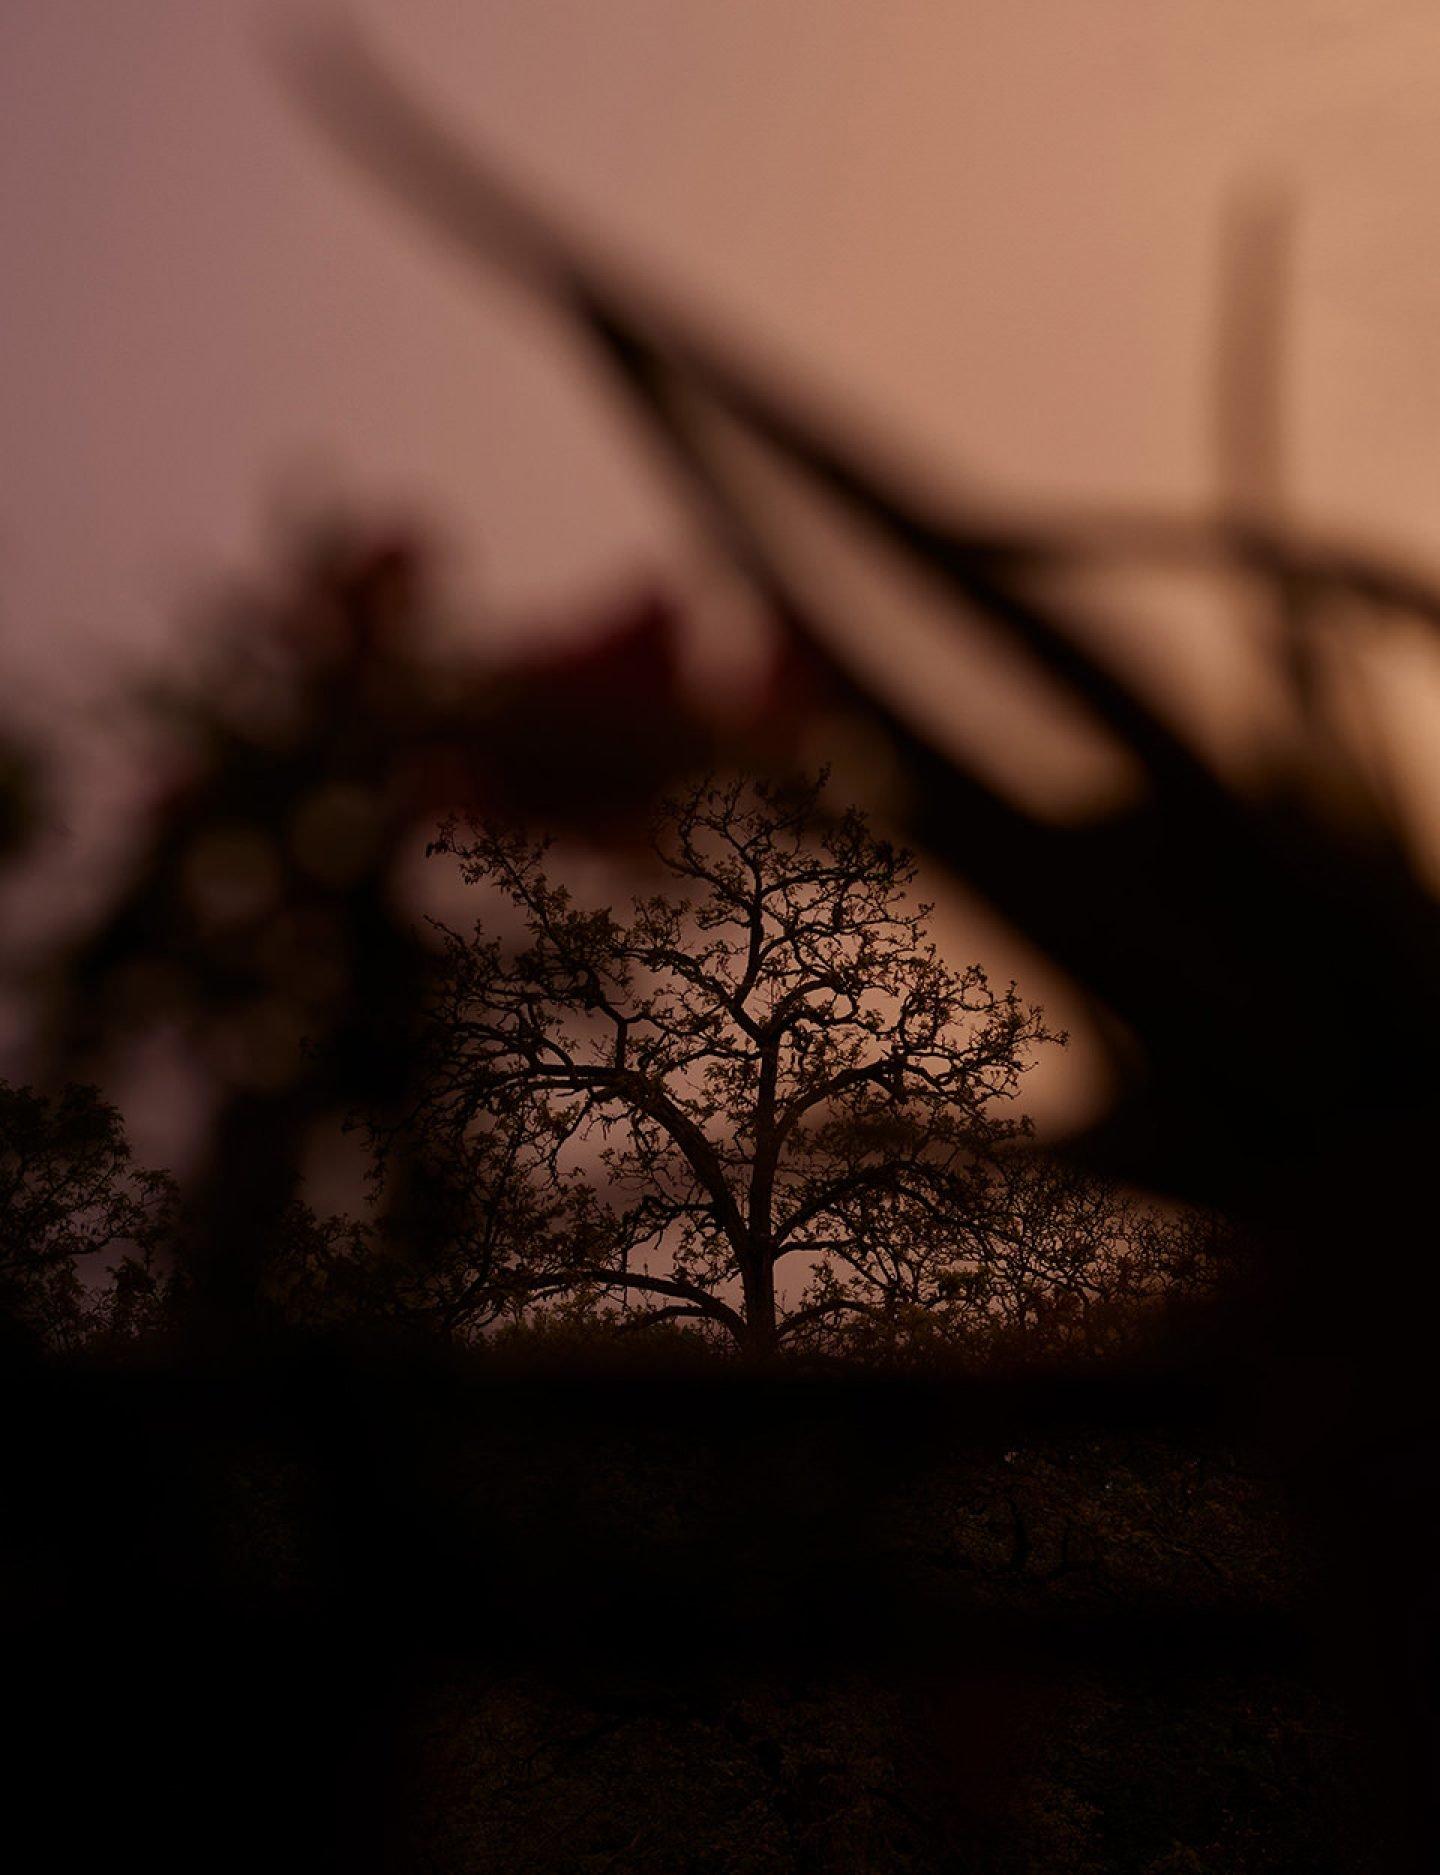 IGNANT-Photography-Gruenberger-ALetterToAFriend-1